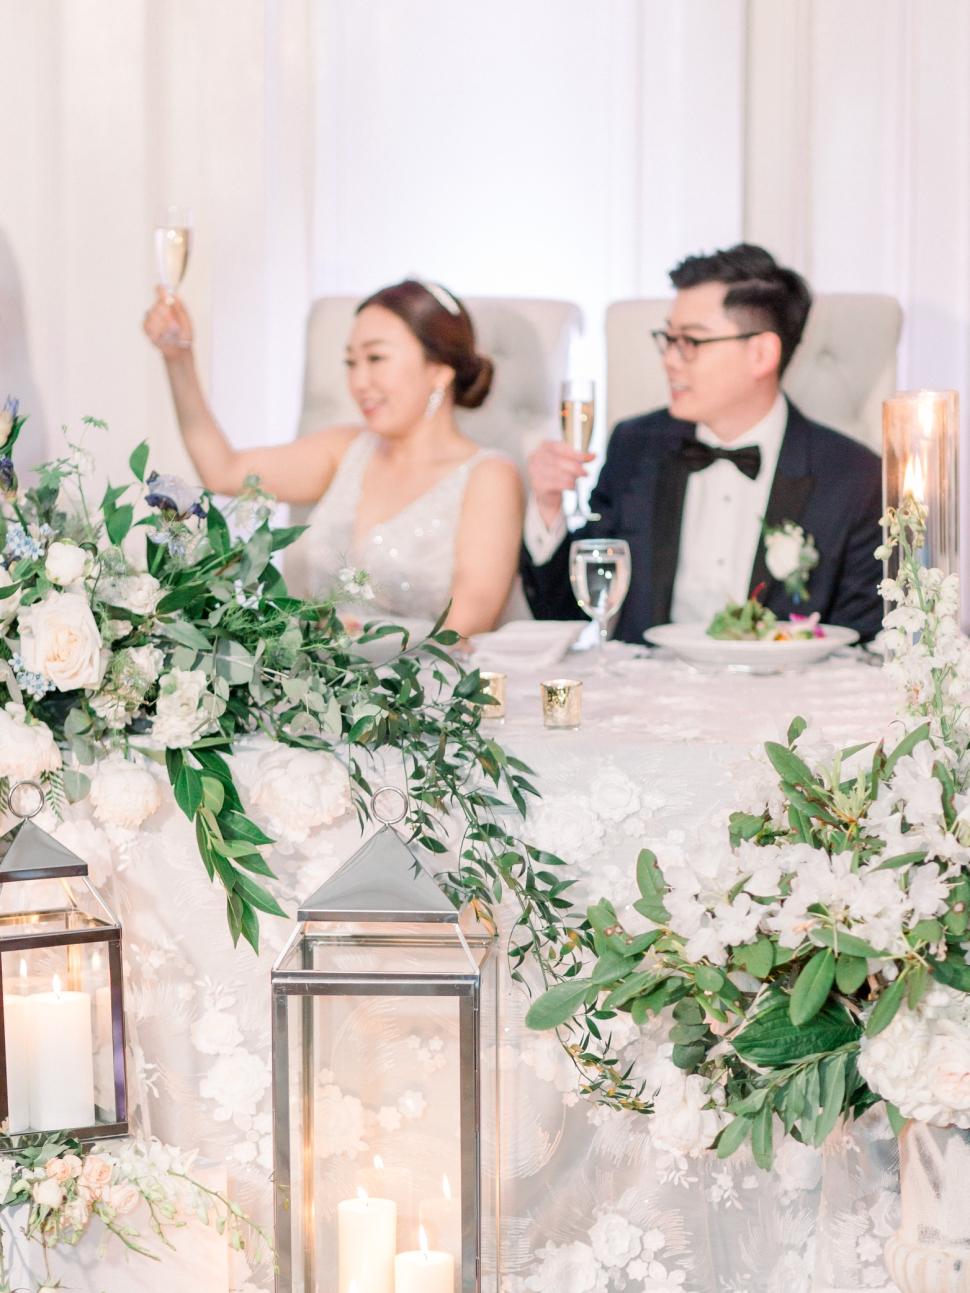 Bourne-Mansion-Wedding-Photos-Cassi-Claire-Long-Island-Wedding-Photographer_48.jpg